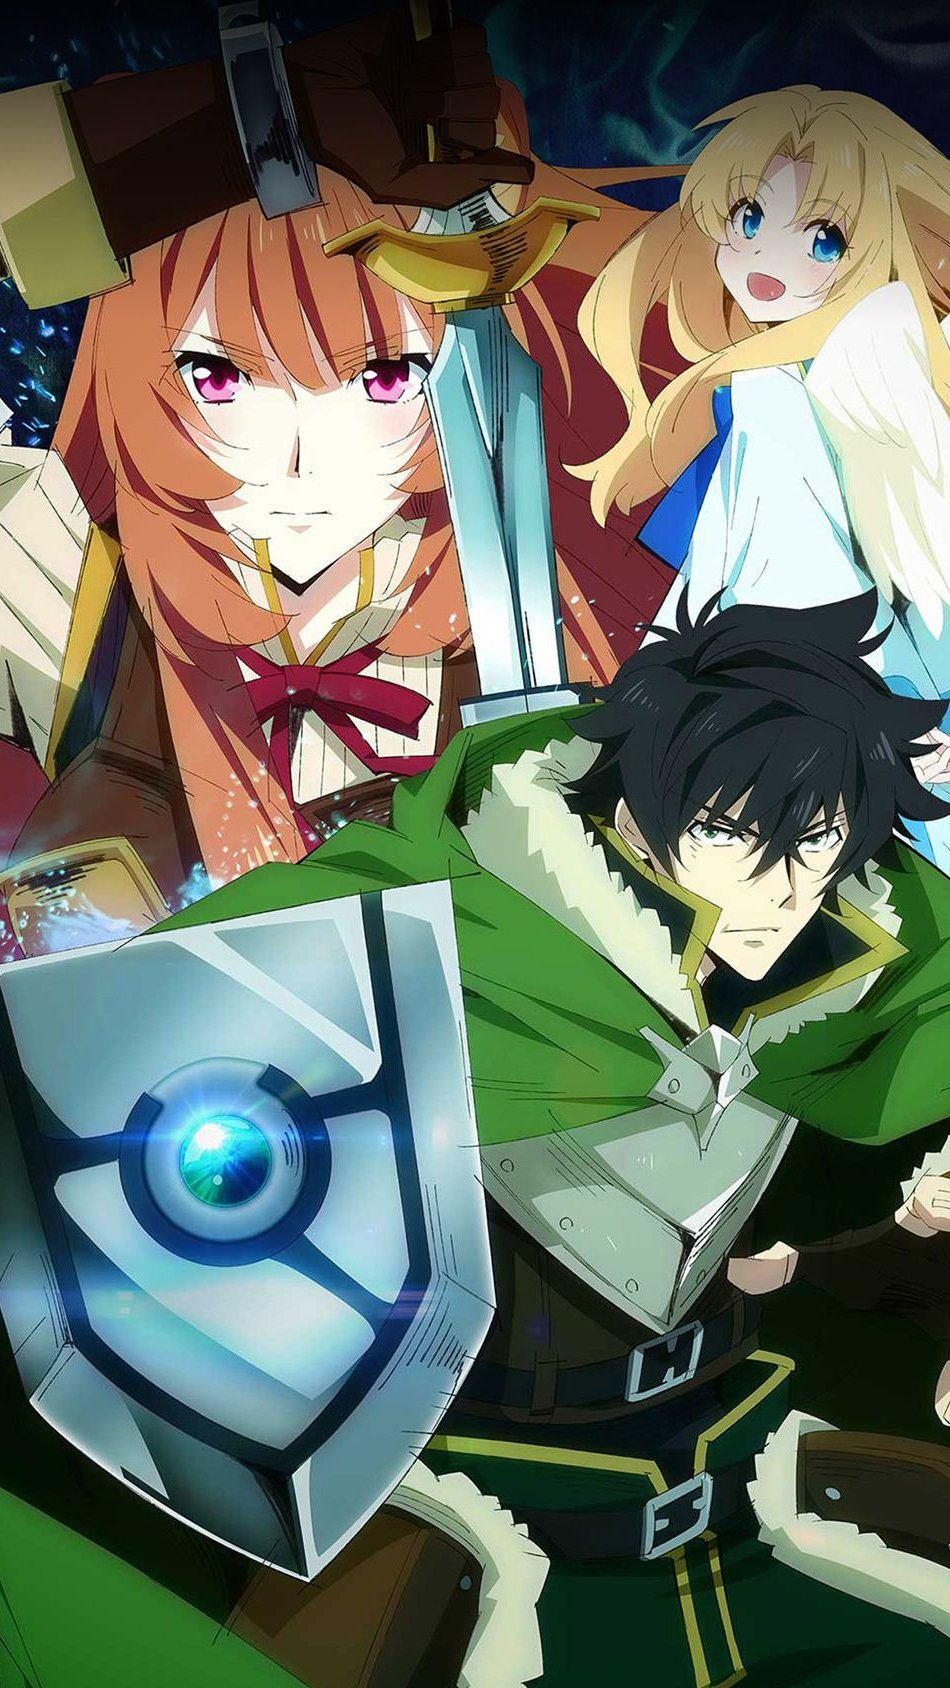 Fondos de pantalla Anime El ascenso del Heroe del Escudo Vertical